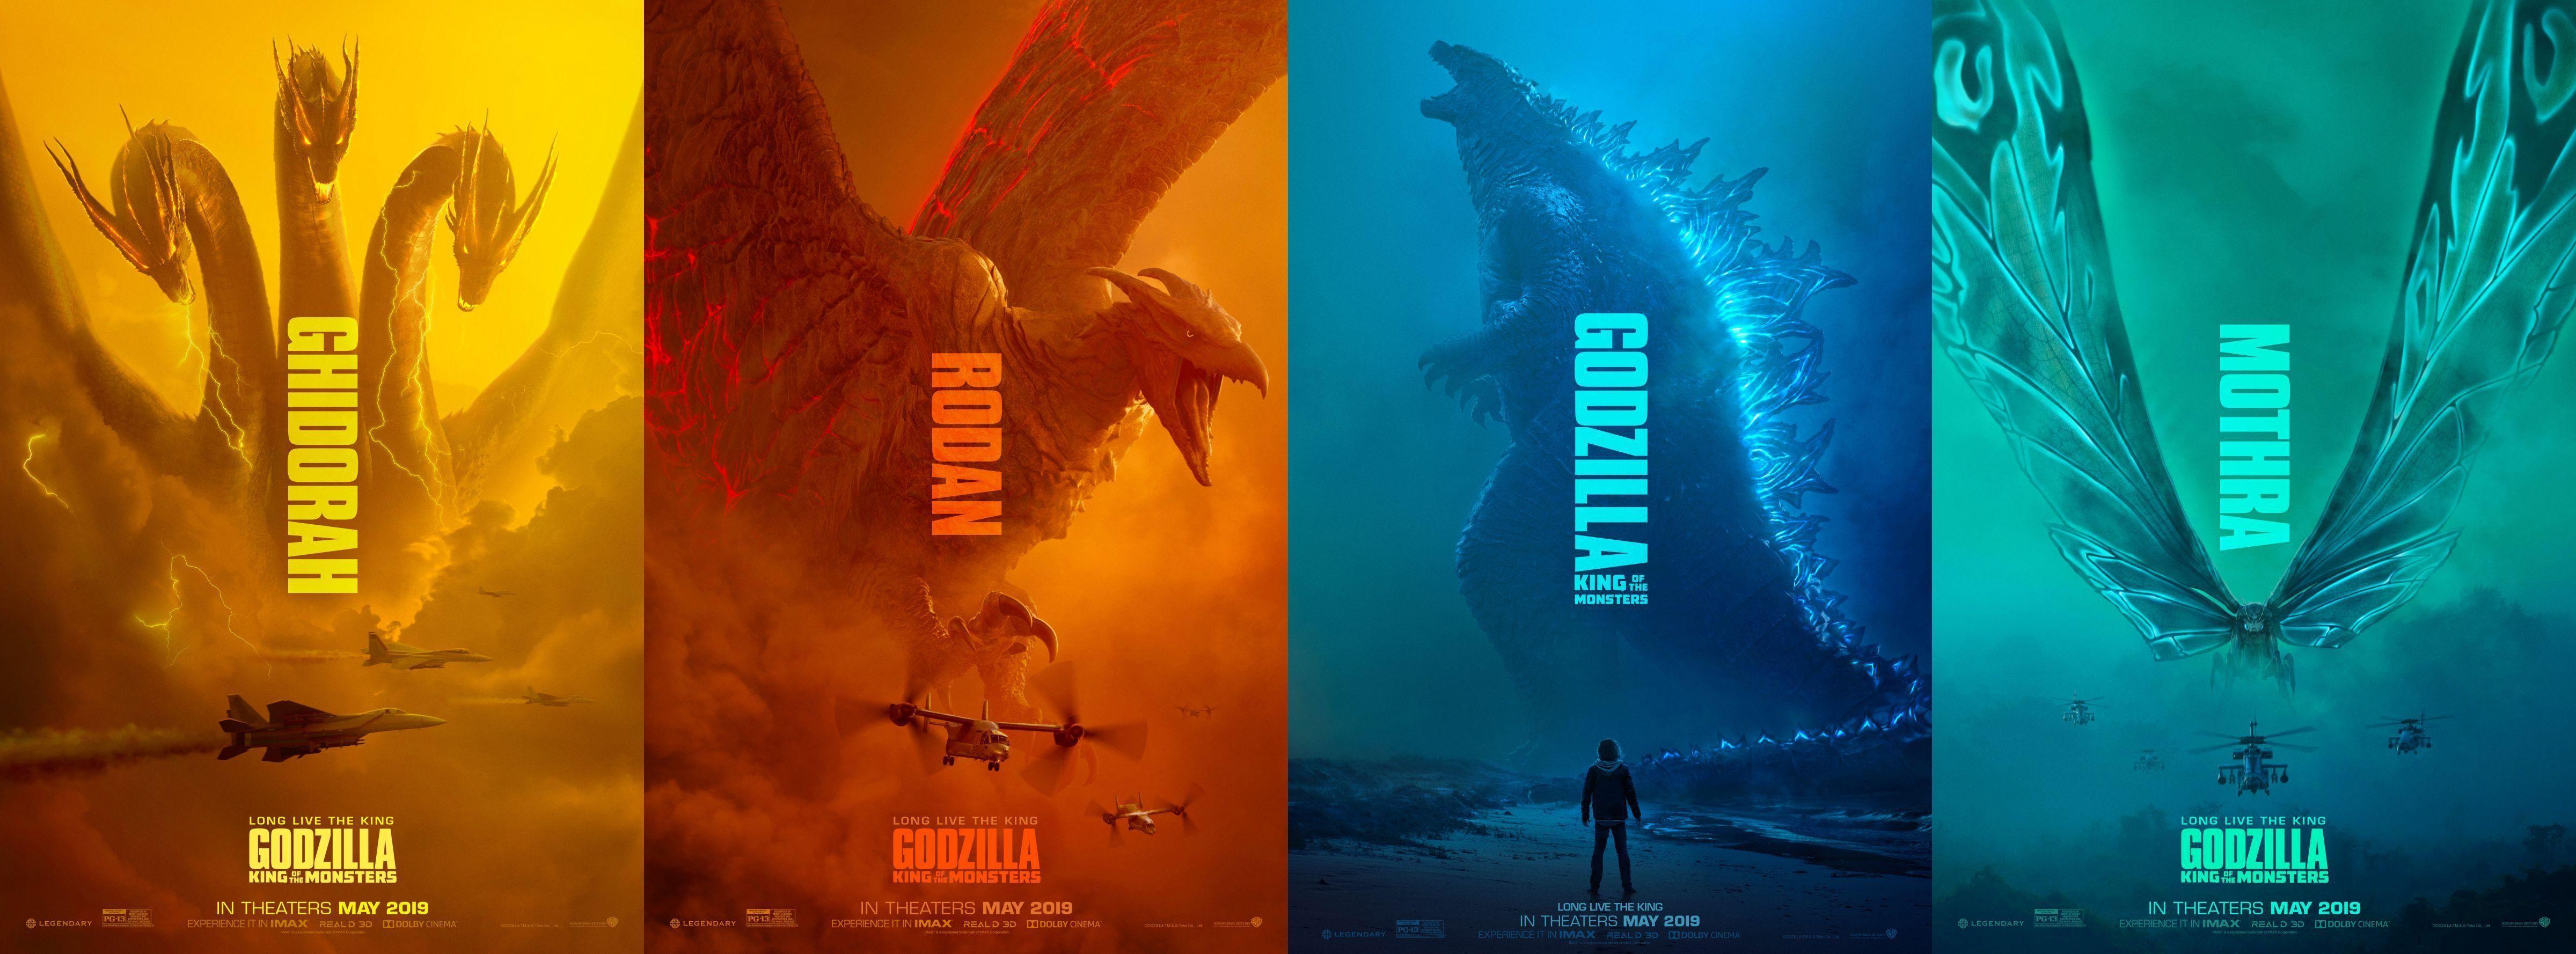 Cool Godzilla 4k Wallpapers Top Free Cool Godzilla 4k